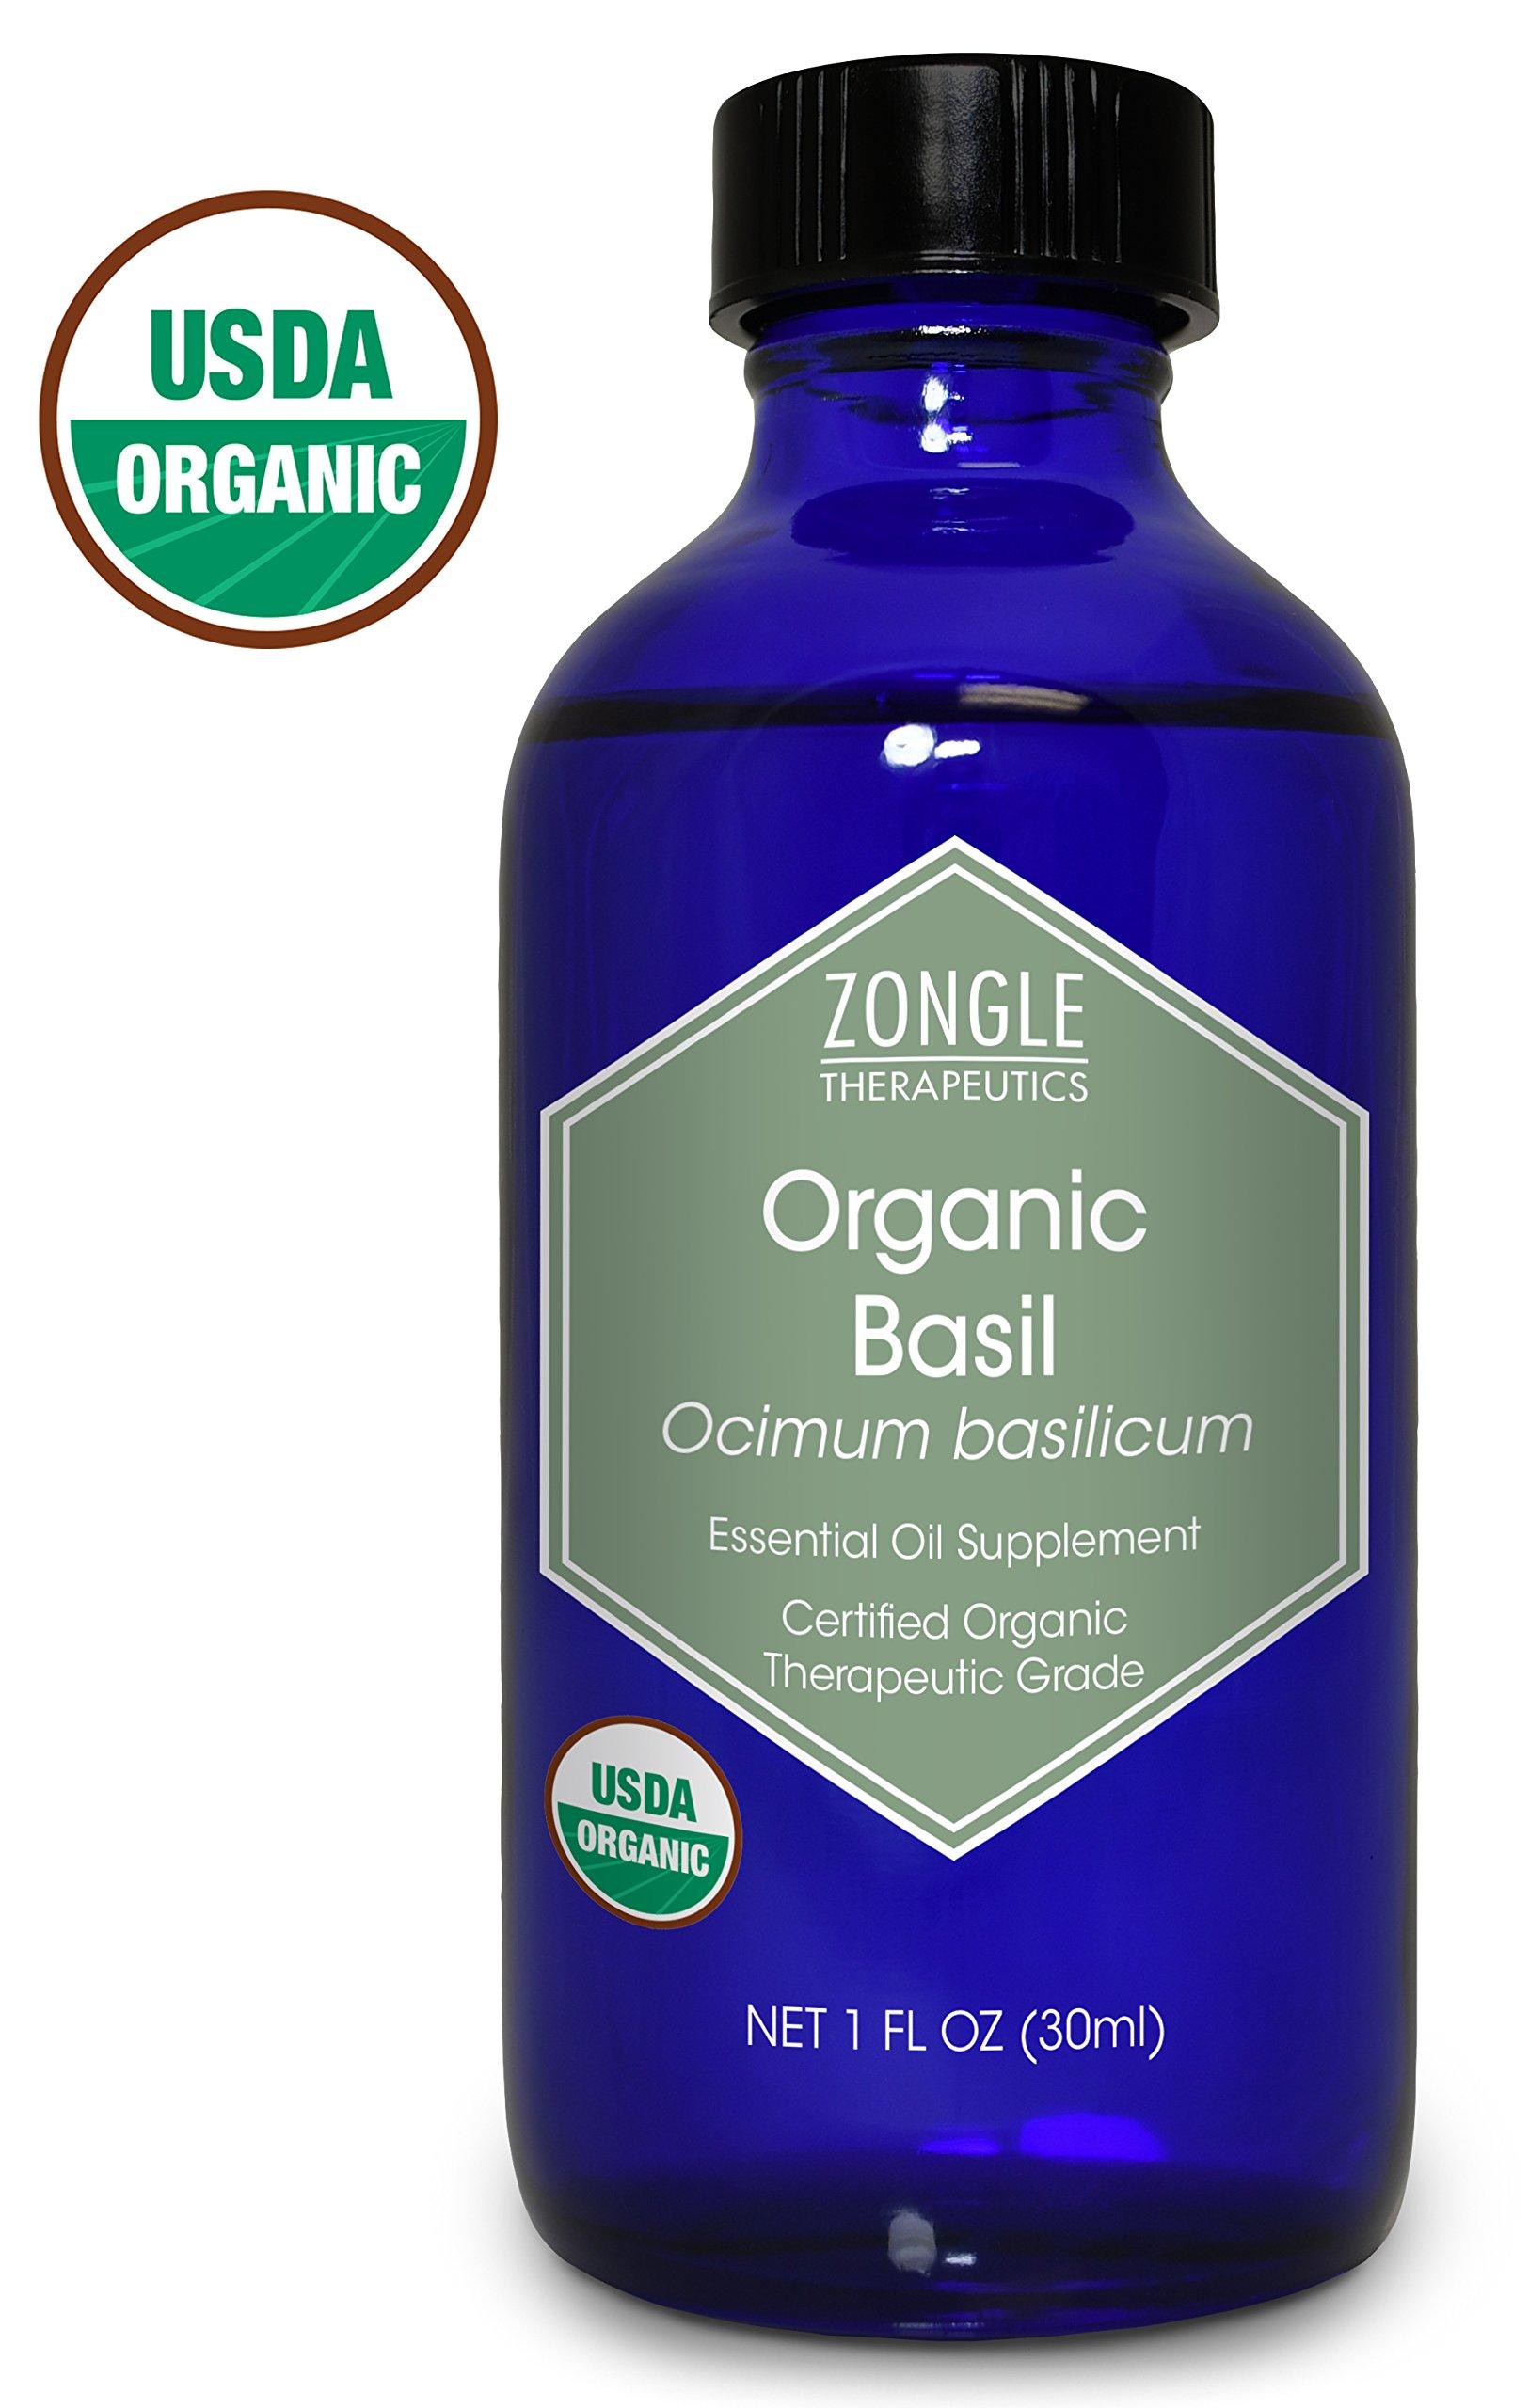 Zongle USDA Certified Organic Basil Essential Oil, Safe to Ingest, Ocimum Basilicum, 1 oz